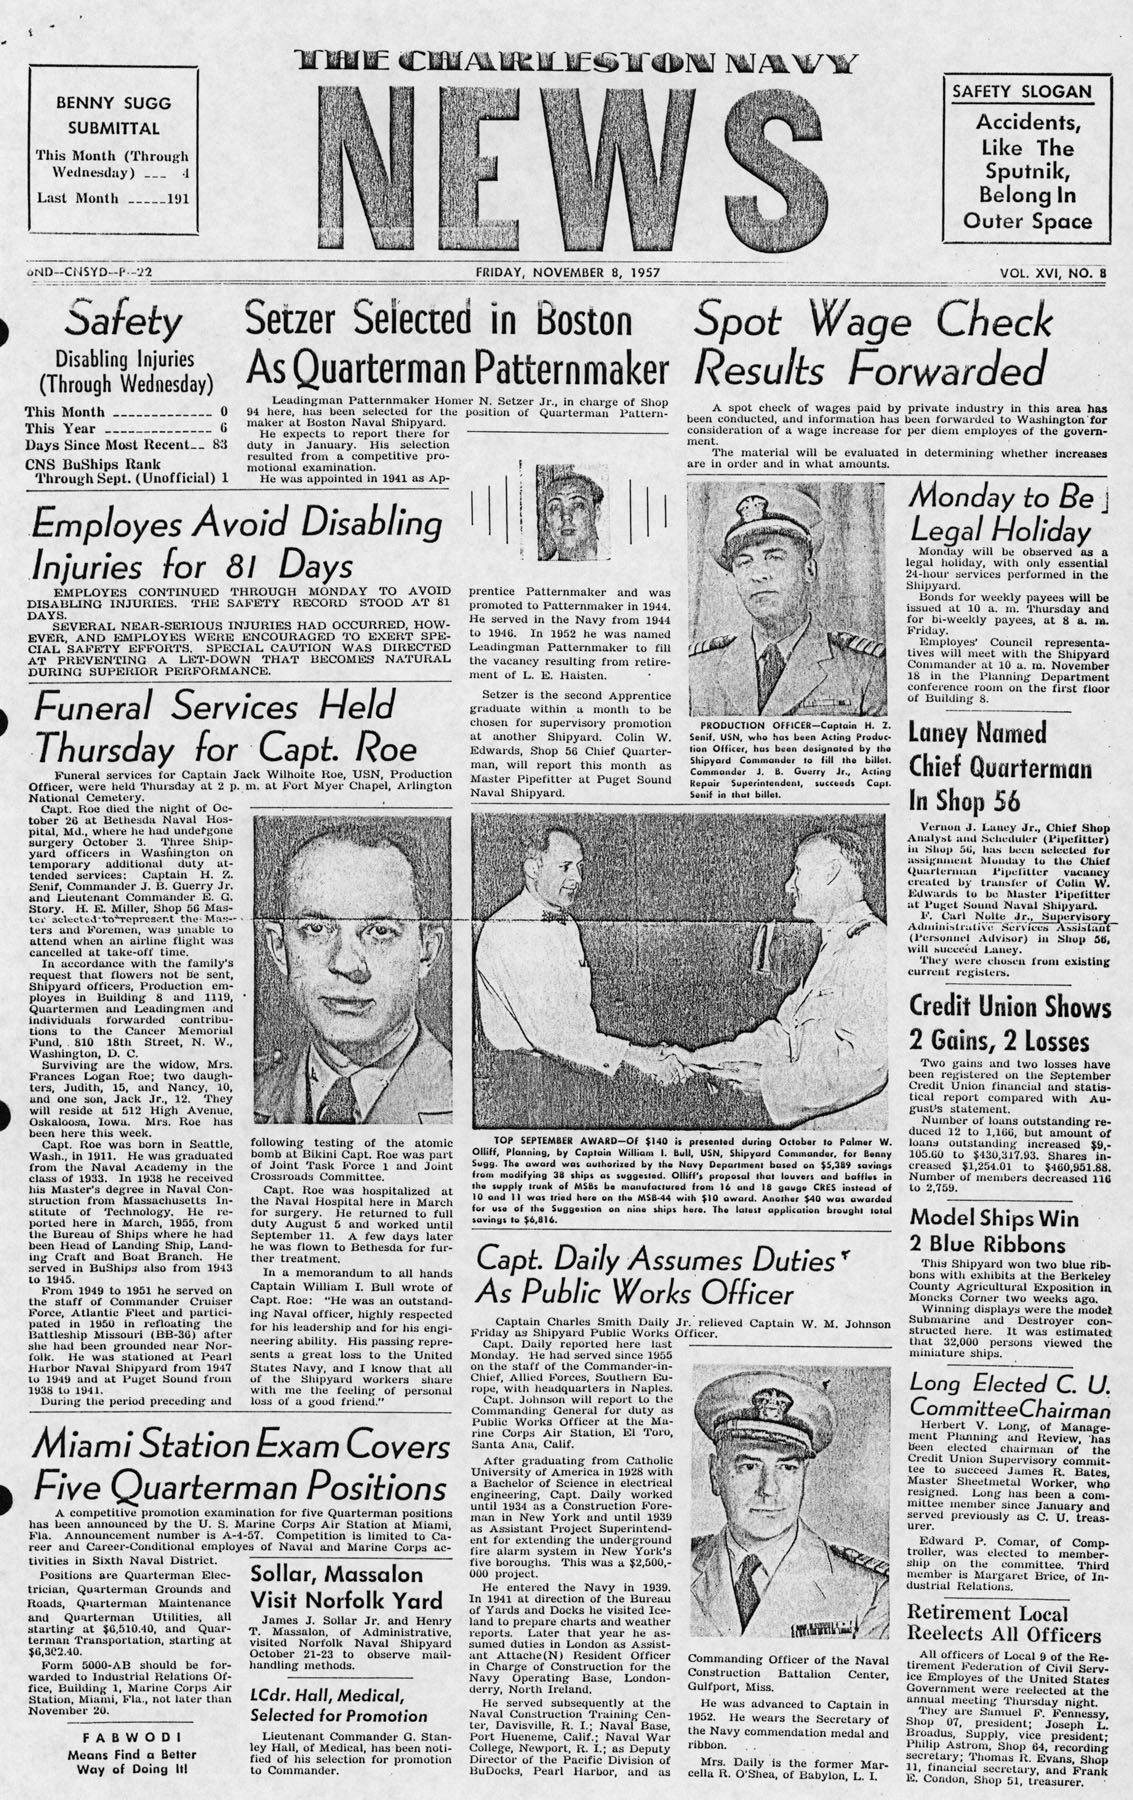 The Charleston Navy News, Volume 16, Edition 8, page i